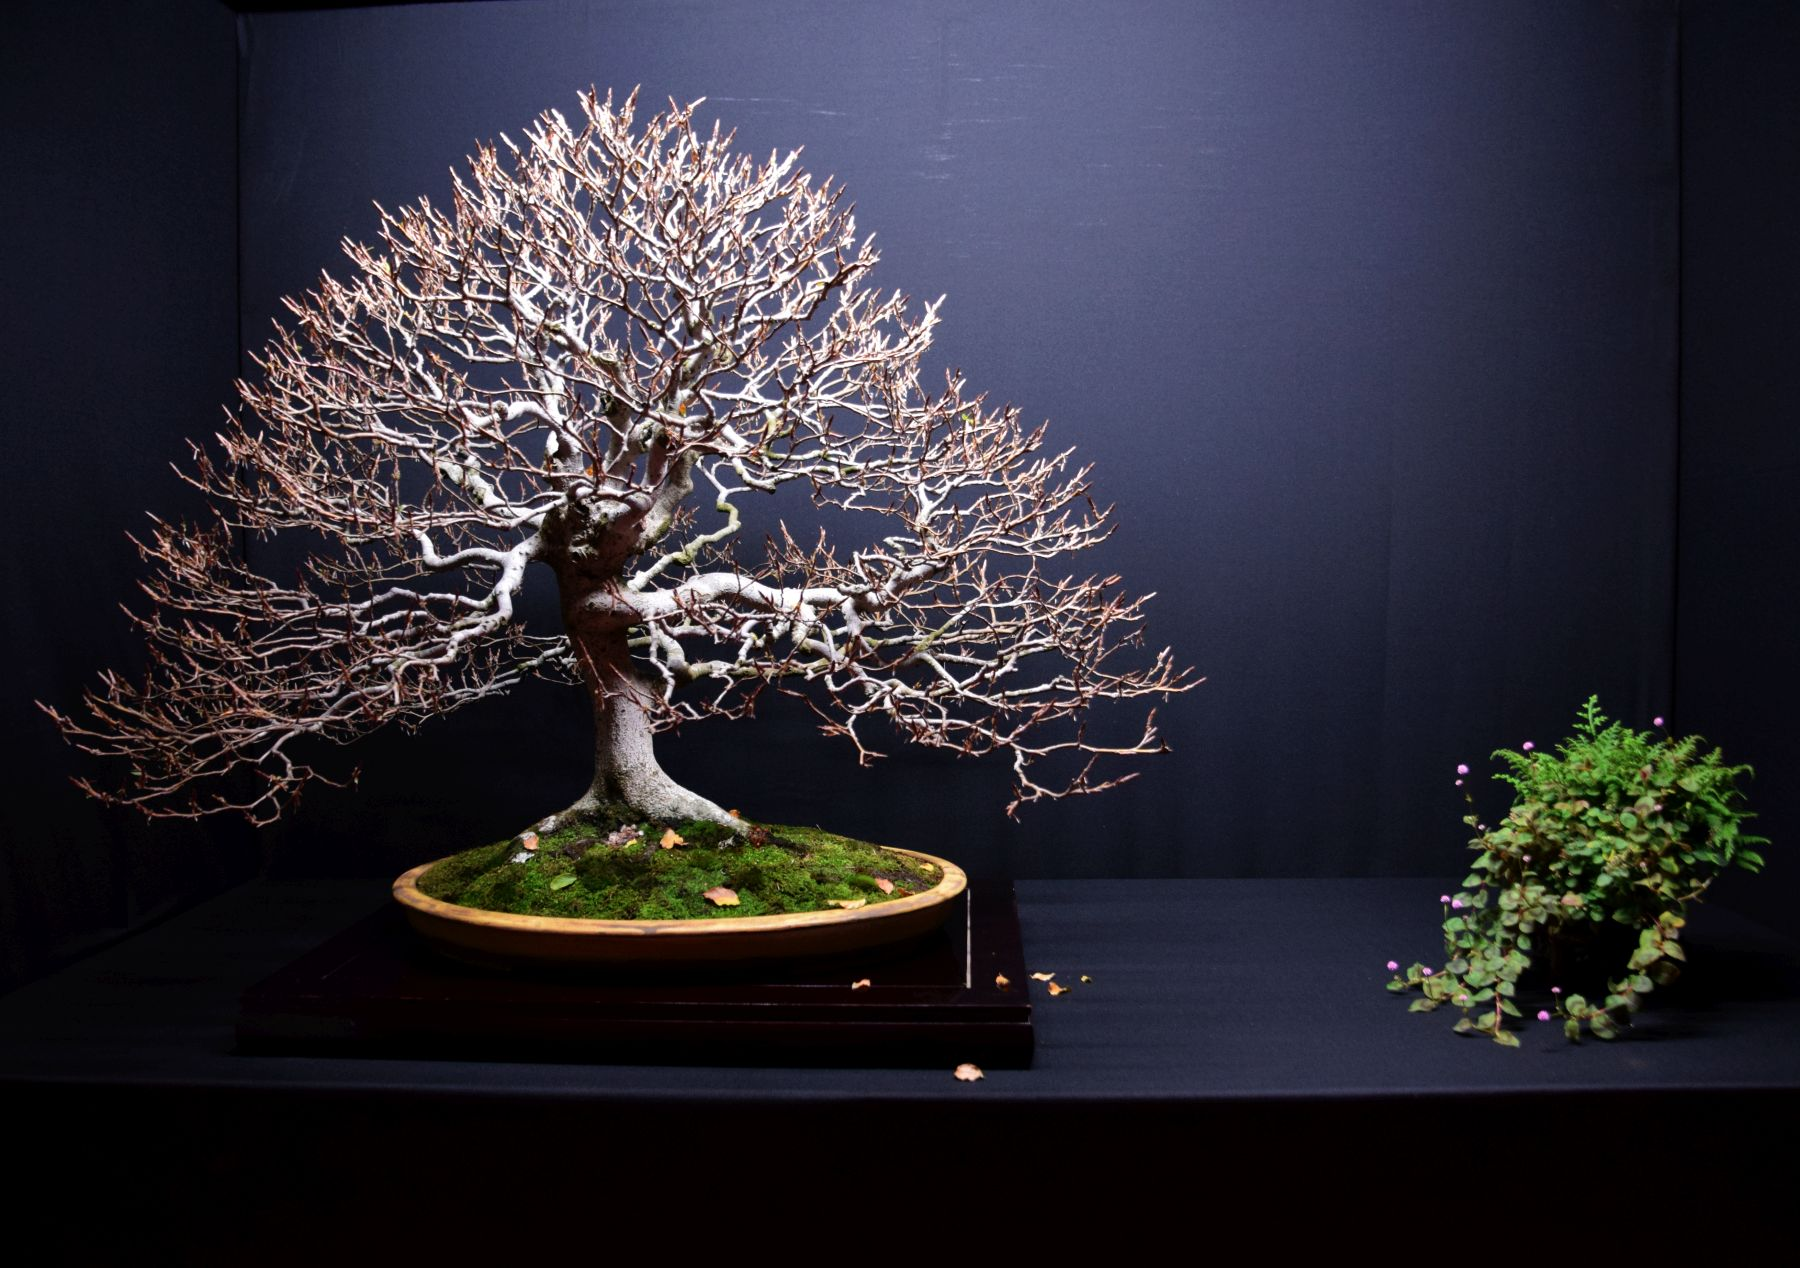 bonsai-museum-luis-vallejo-020